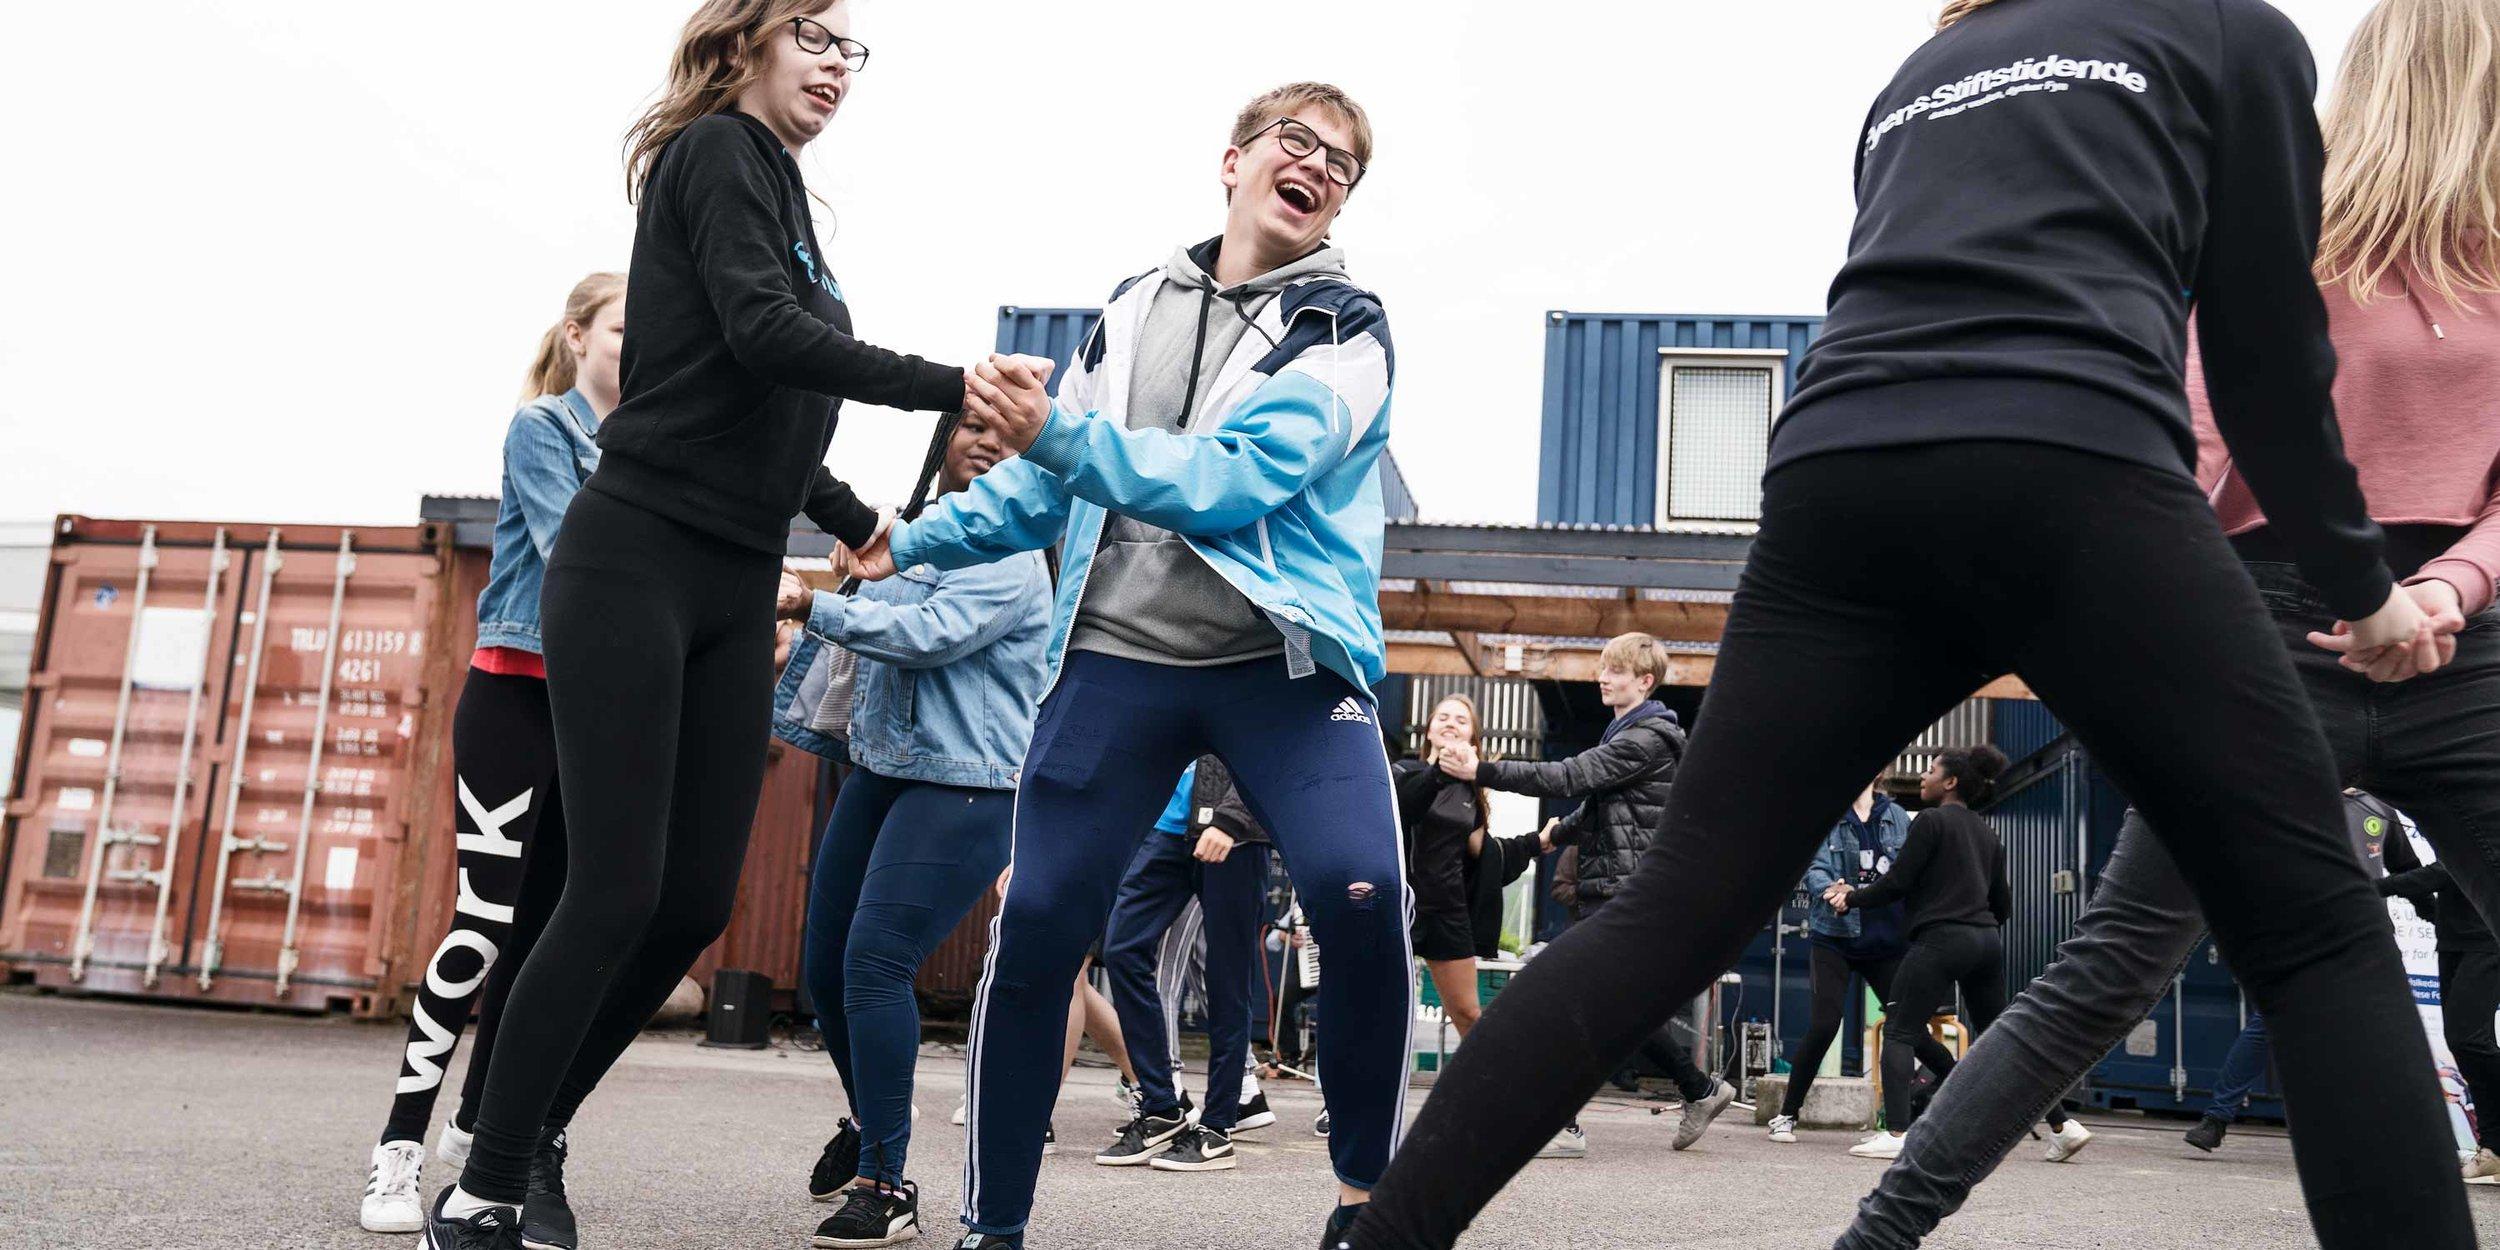 Skoleidrættens Forårsfestival på Byens Ø, Odense.